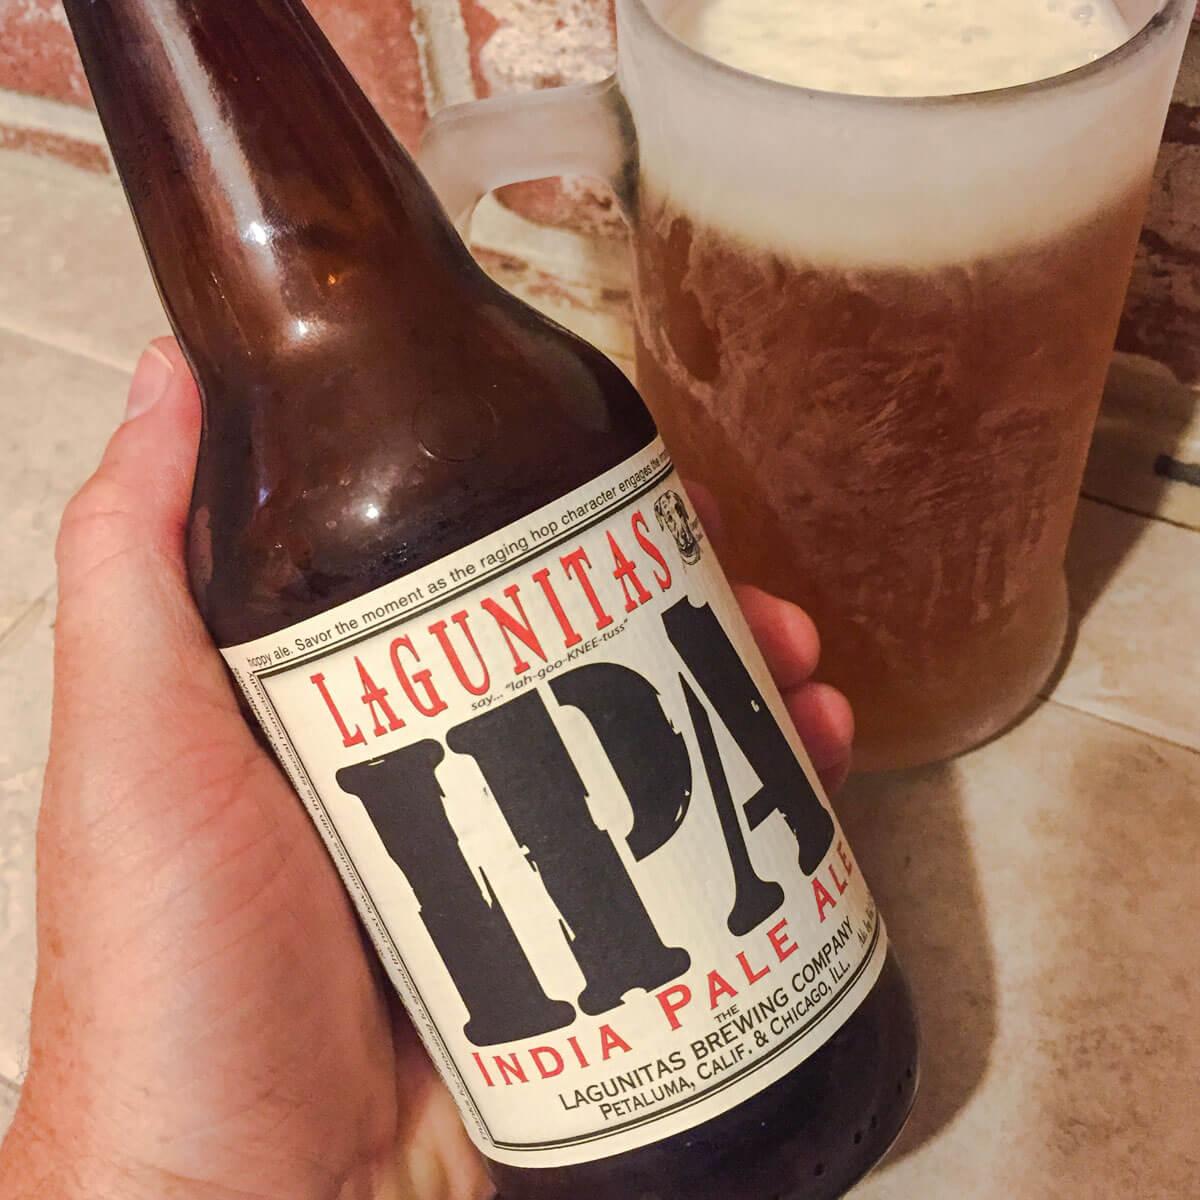 Lagunitas IPA, an American IPA by Lagunitas Brewing Company